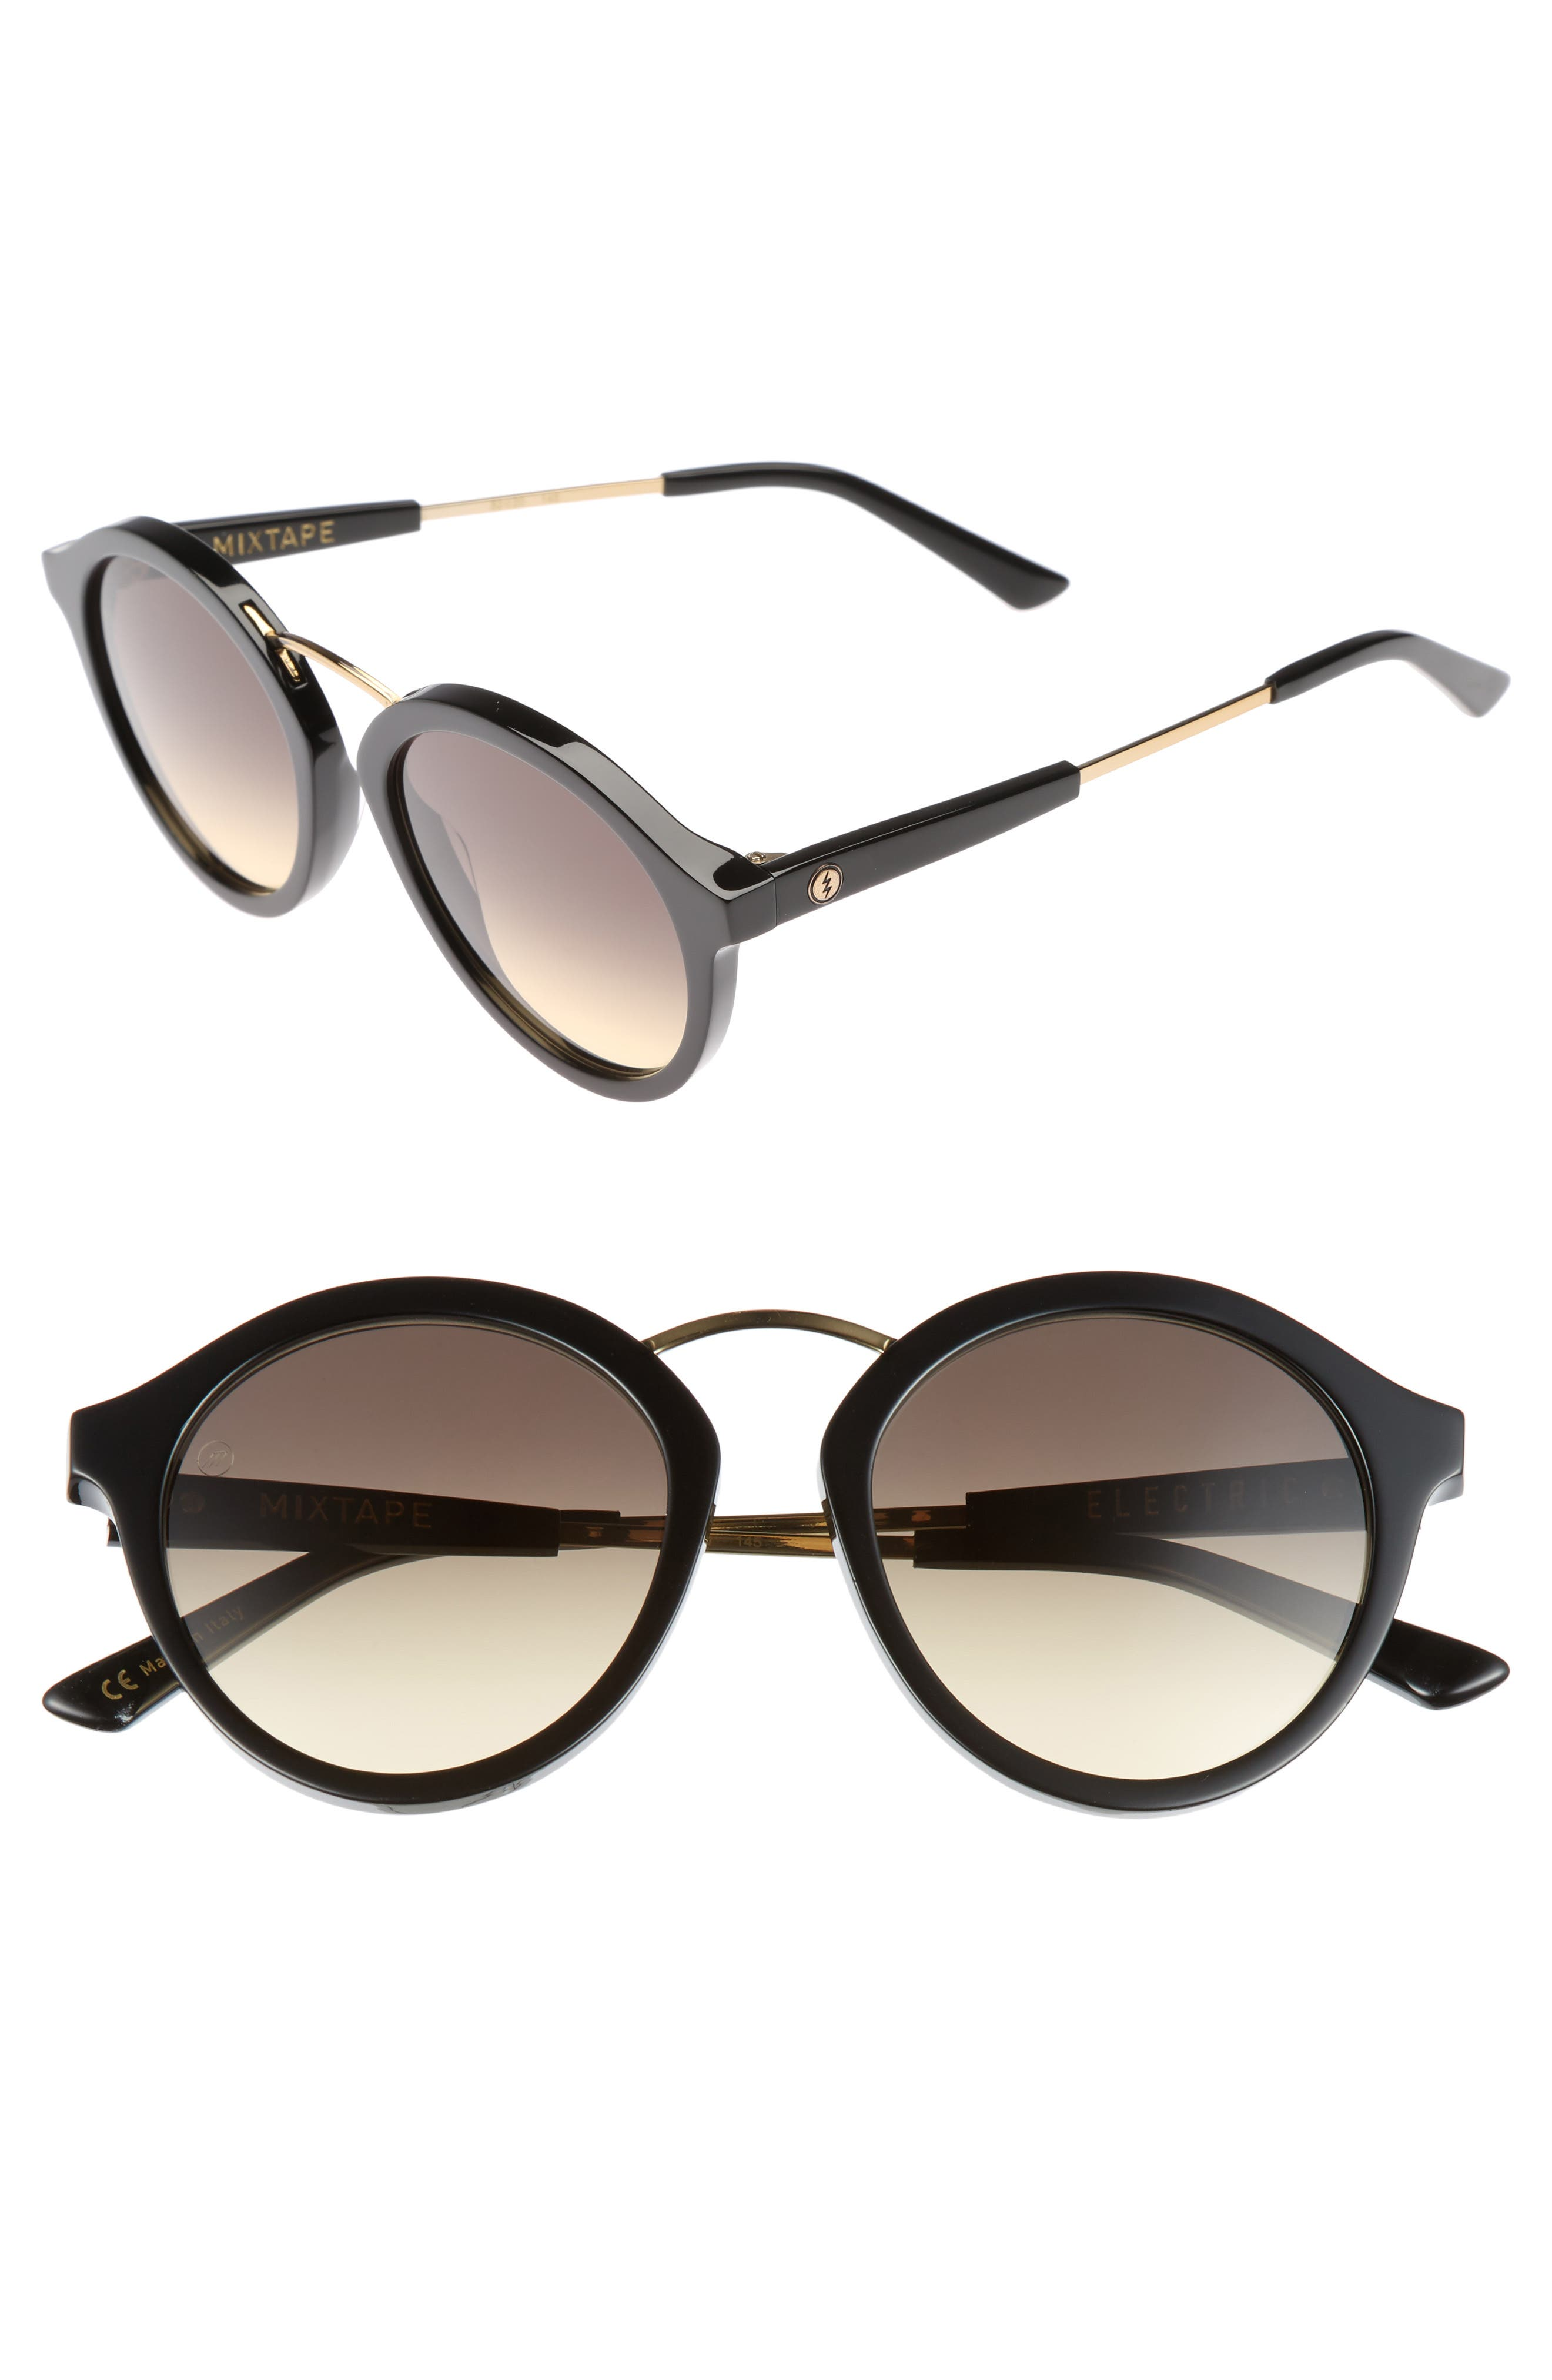 Main Image - ELECTRIC Mix Tape 52mm Gradient Round Sunglasses